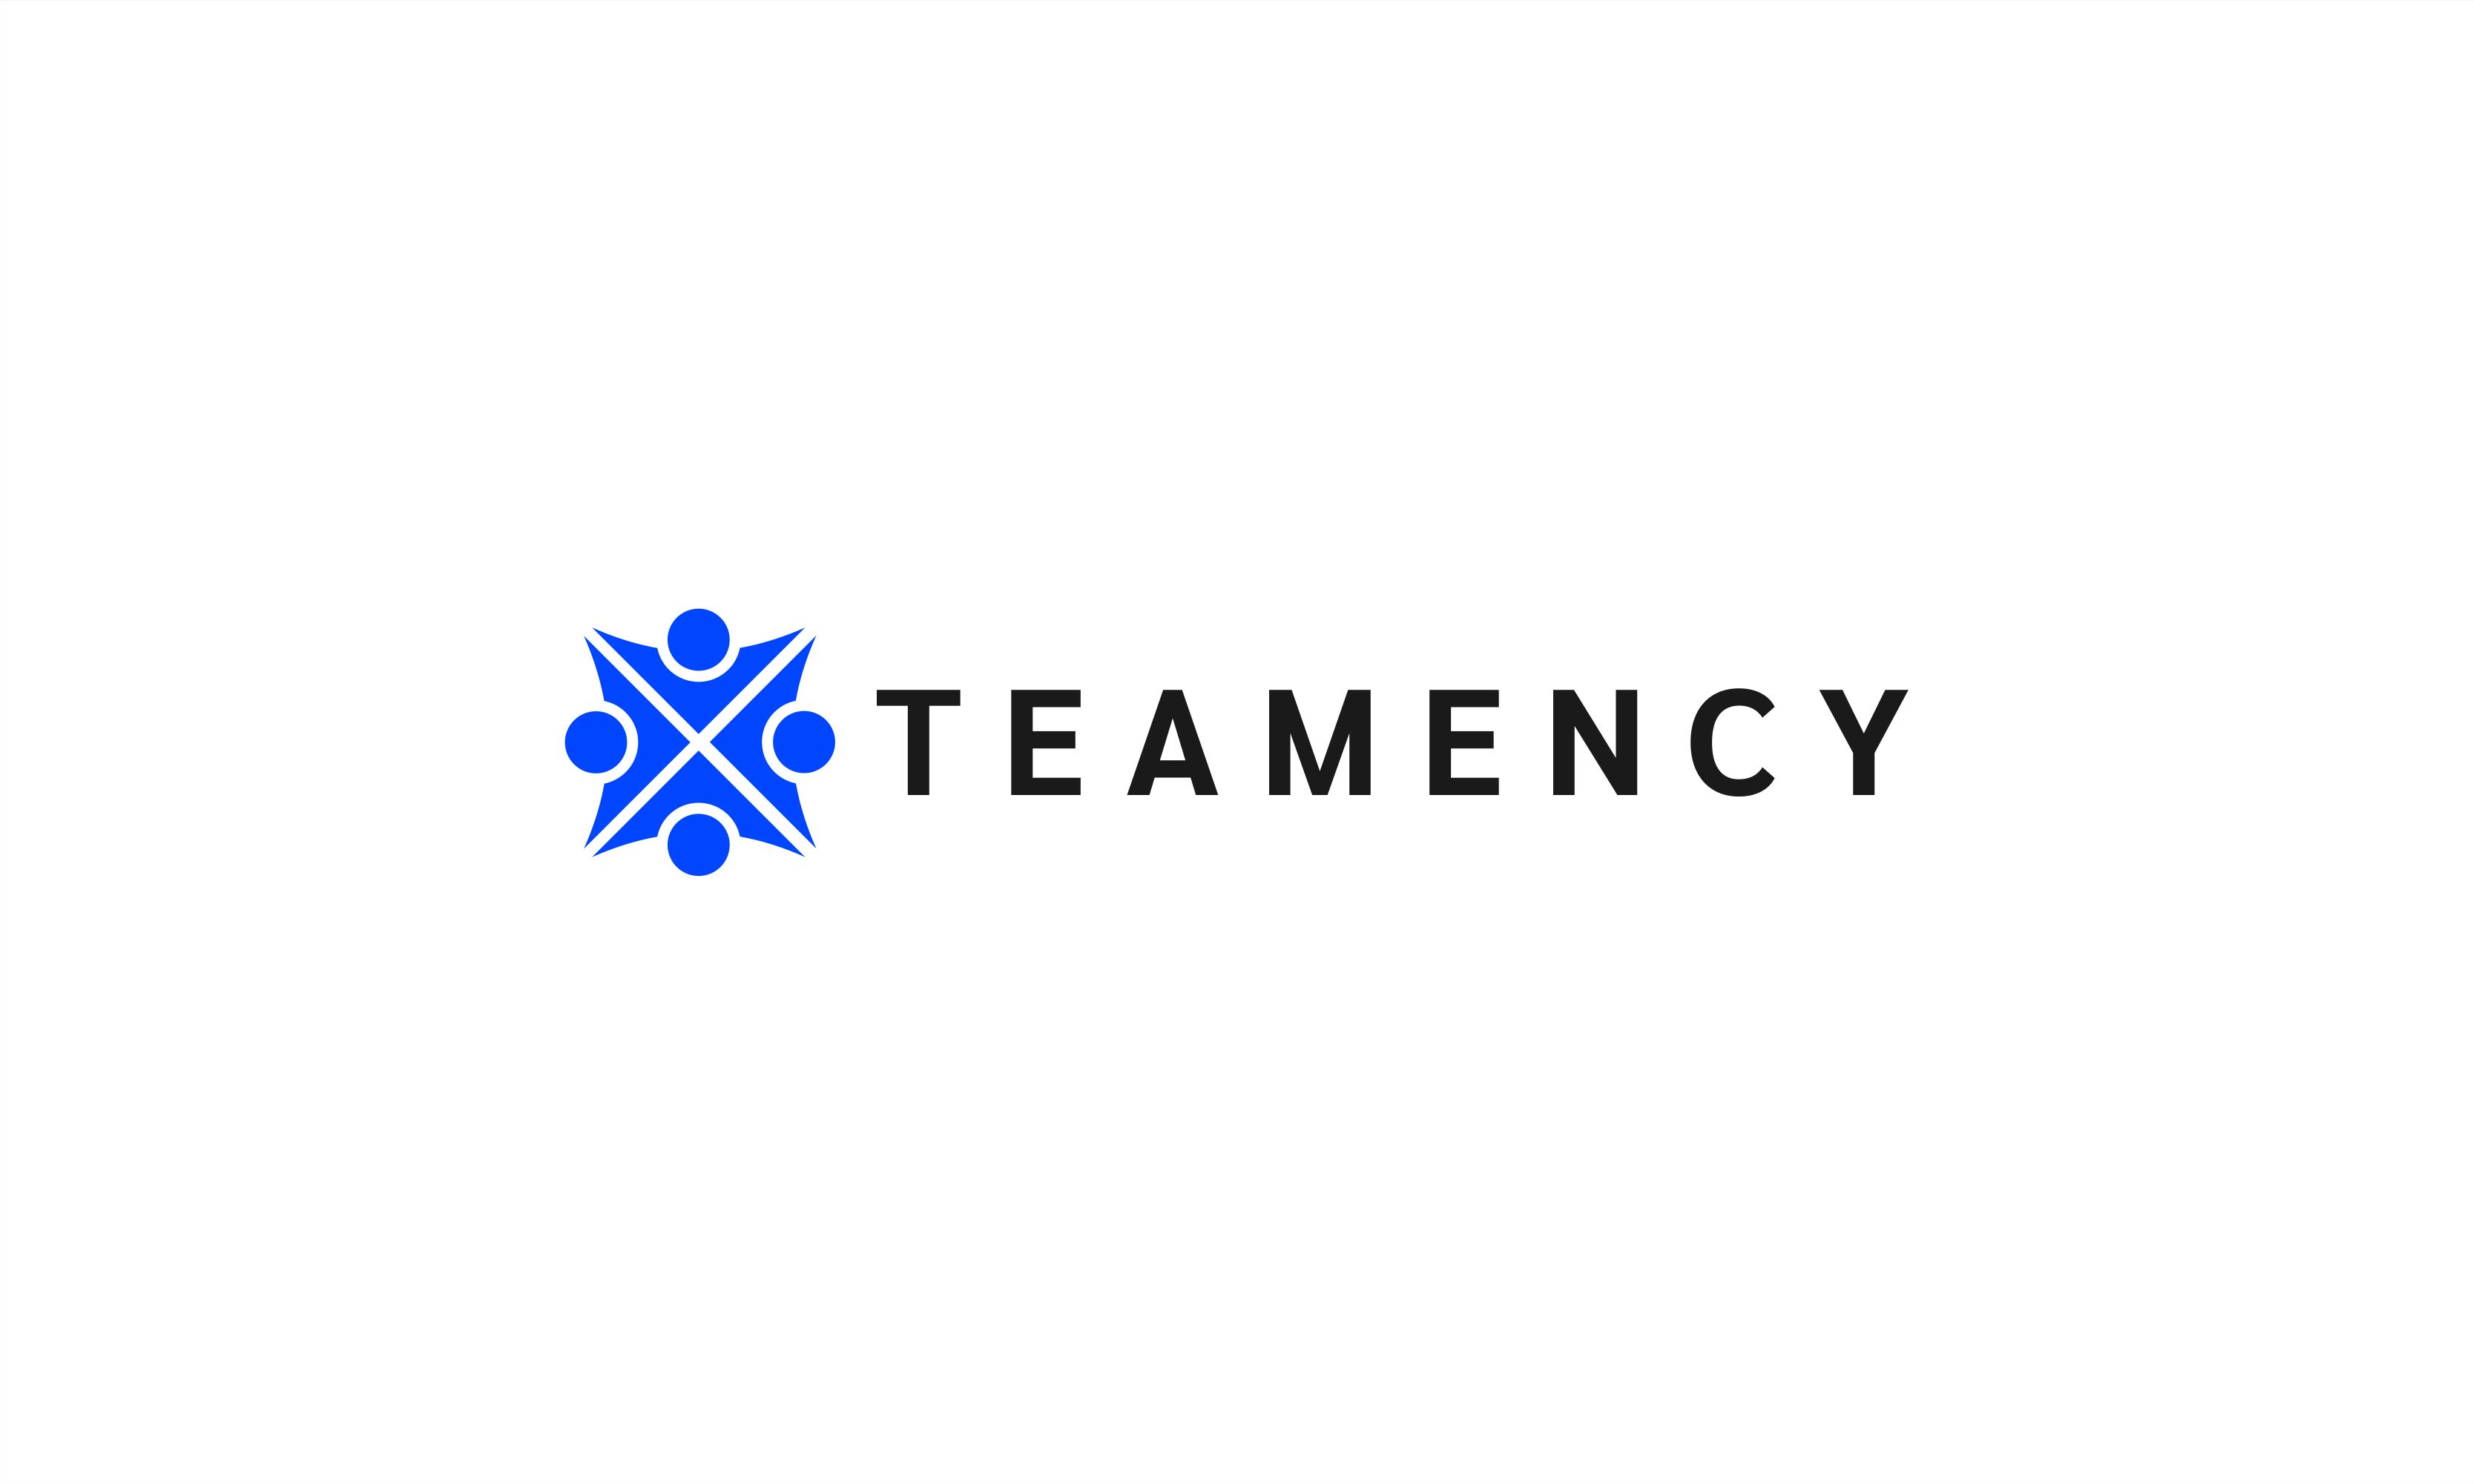 Teamency